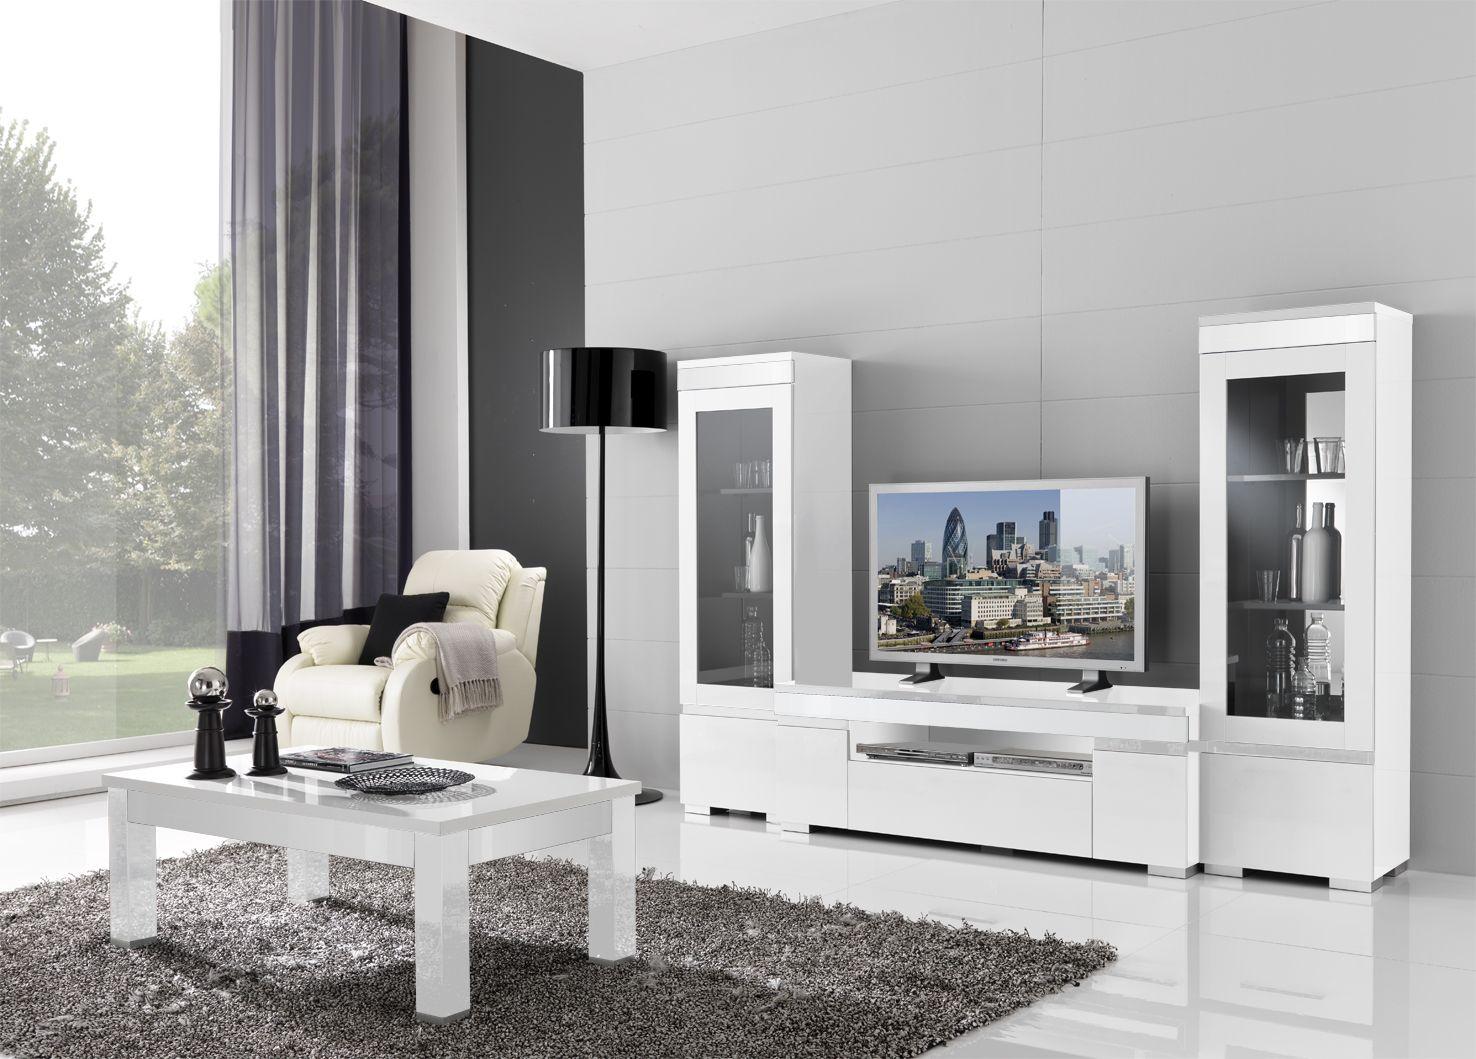 plete woonkamer set model pisano in de kleur zwart wit ook in